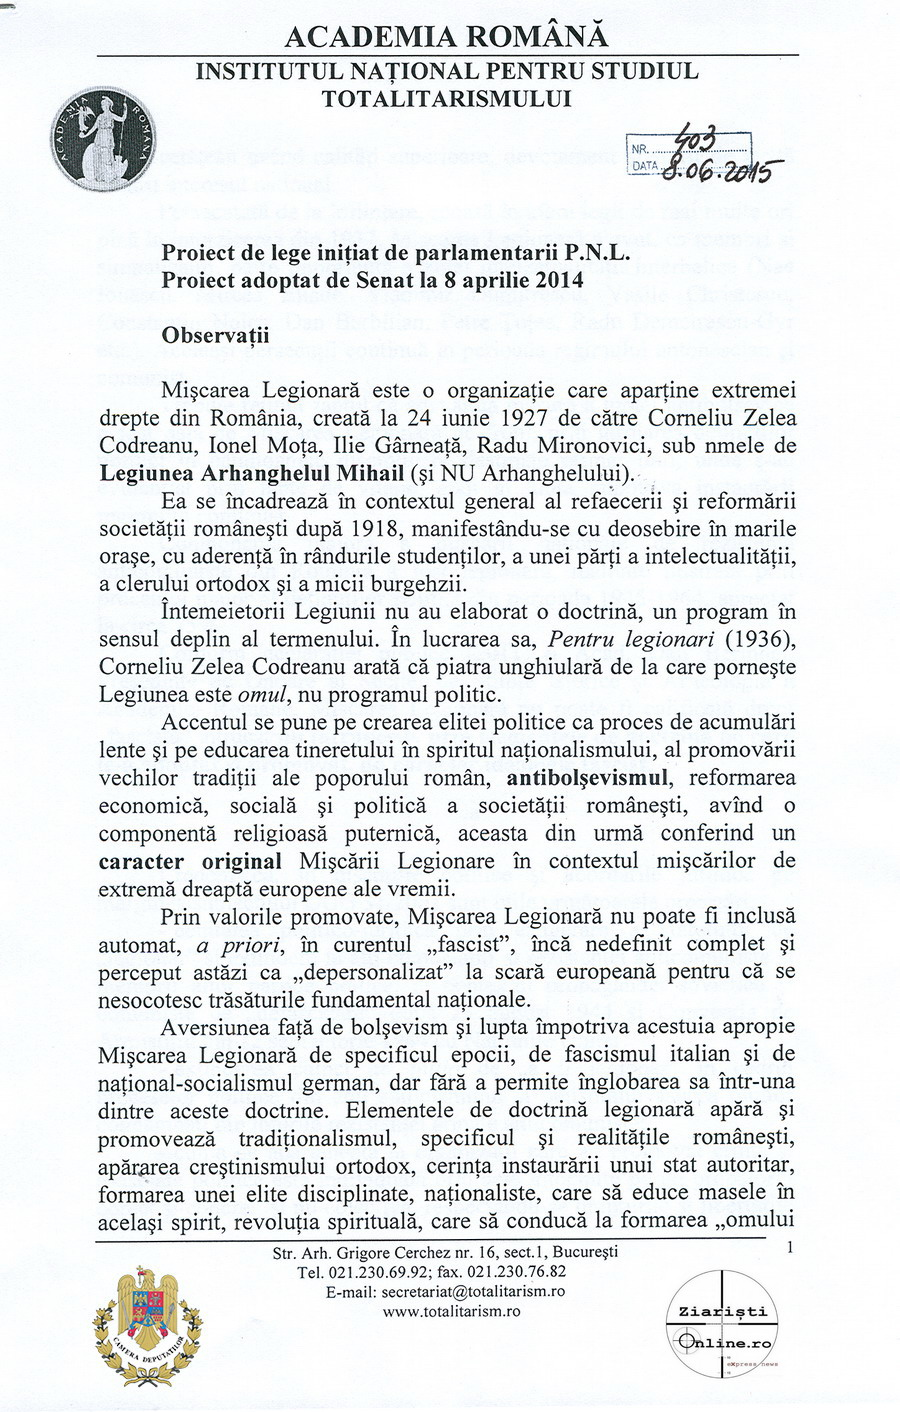 Academia-Romana-INST-despre-Miscarea-Legionara-01-Iunie-2015-Camera-Deputatilor-Ziaristi-Online